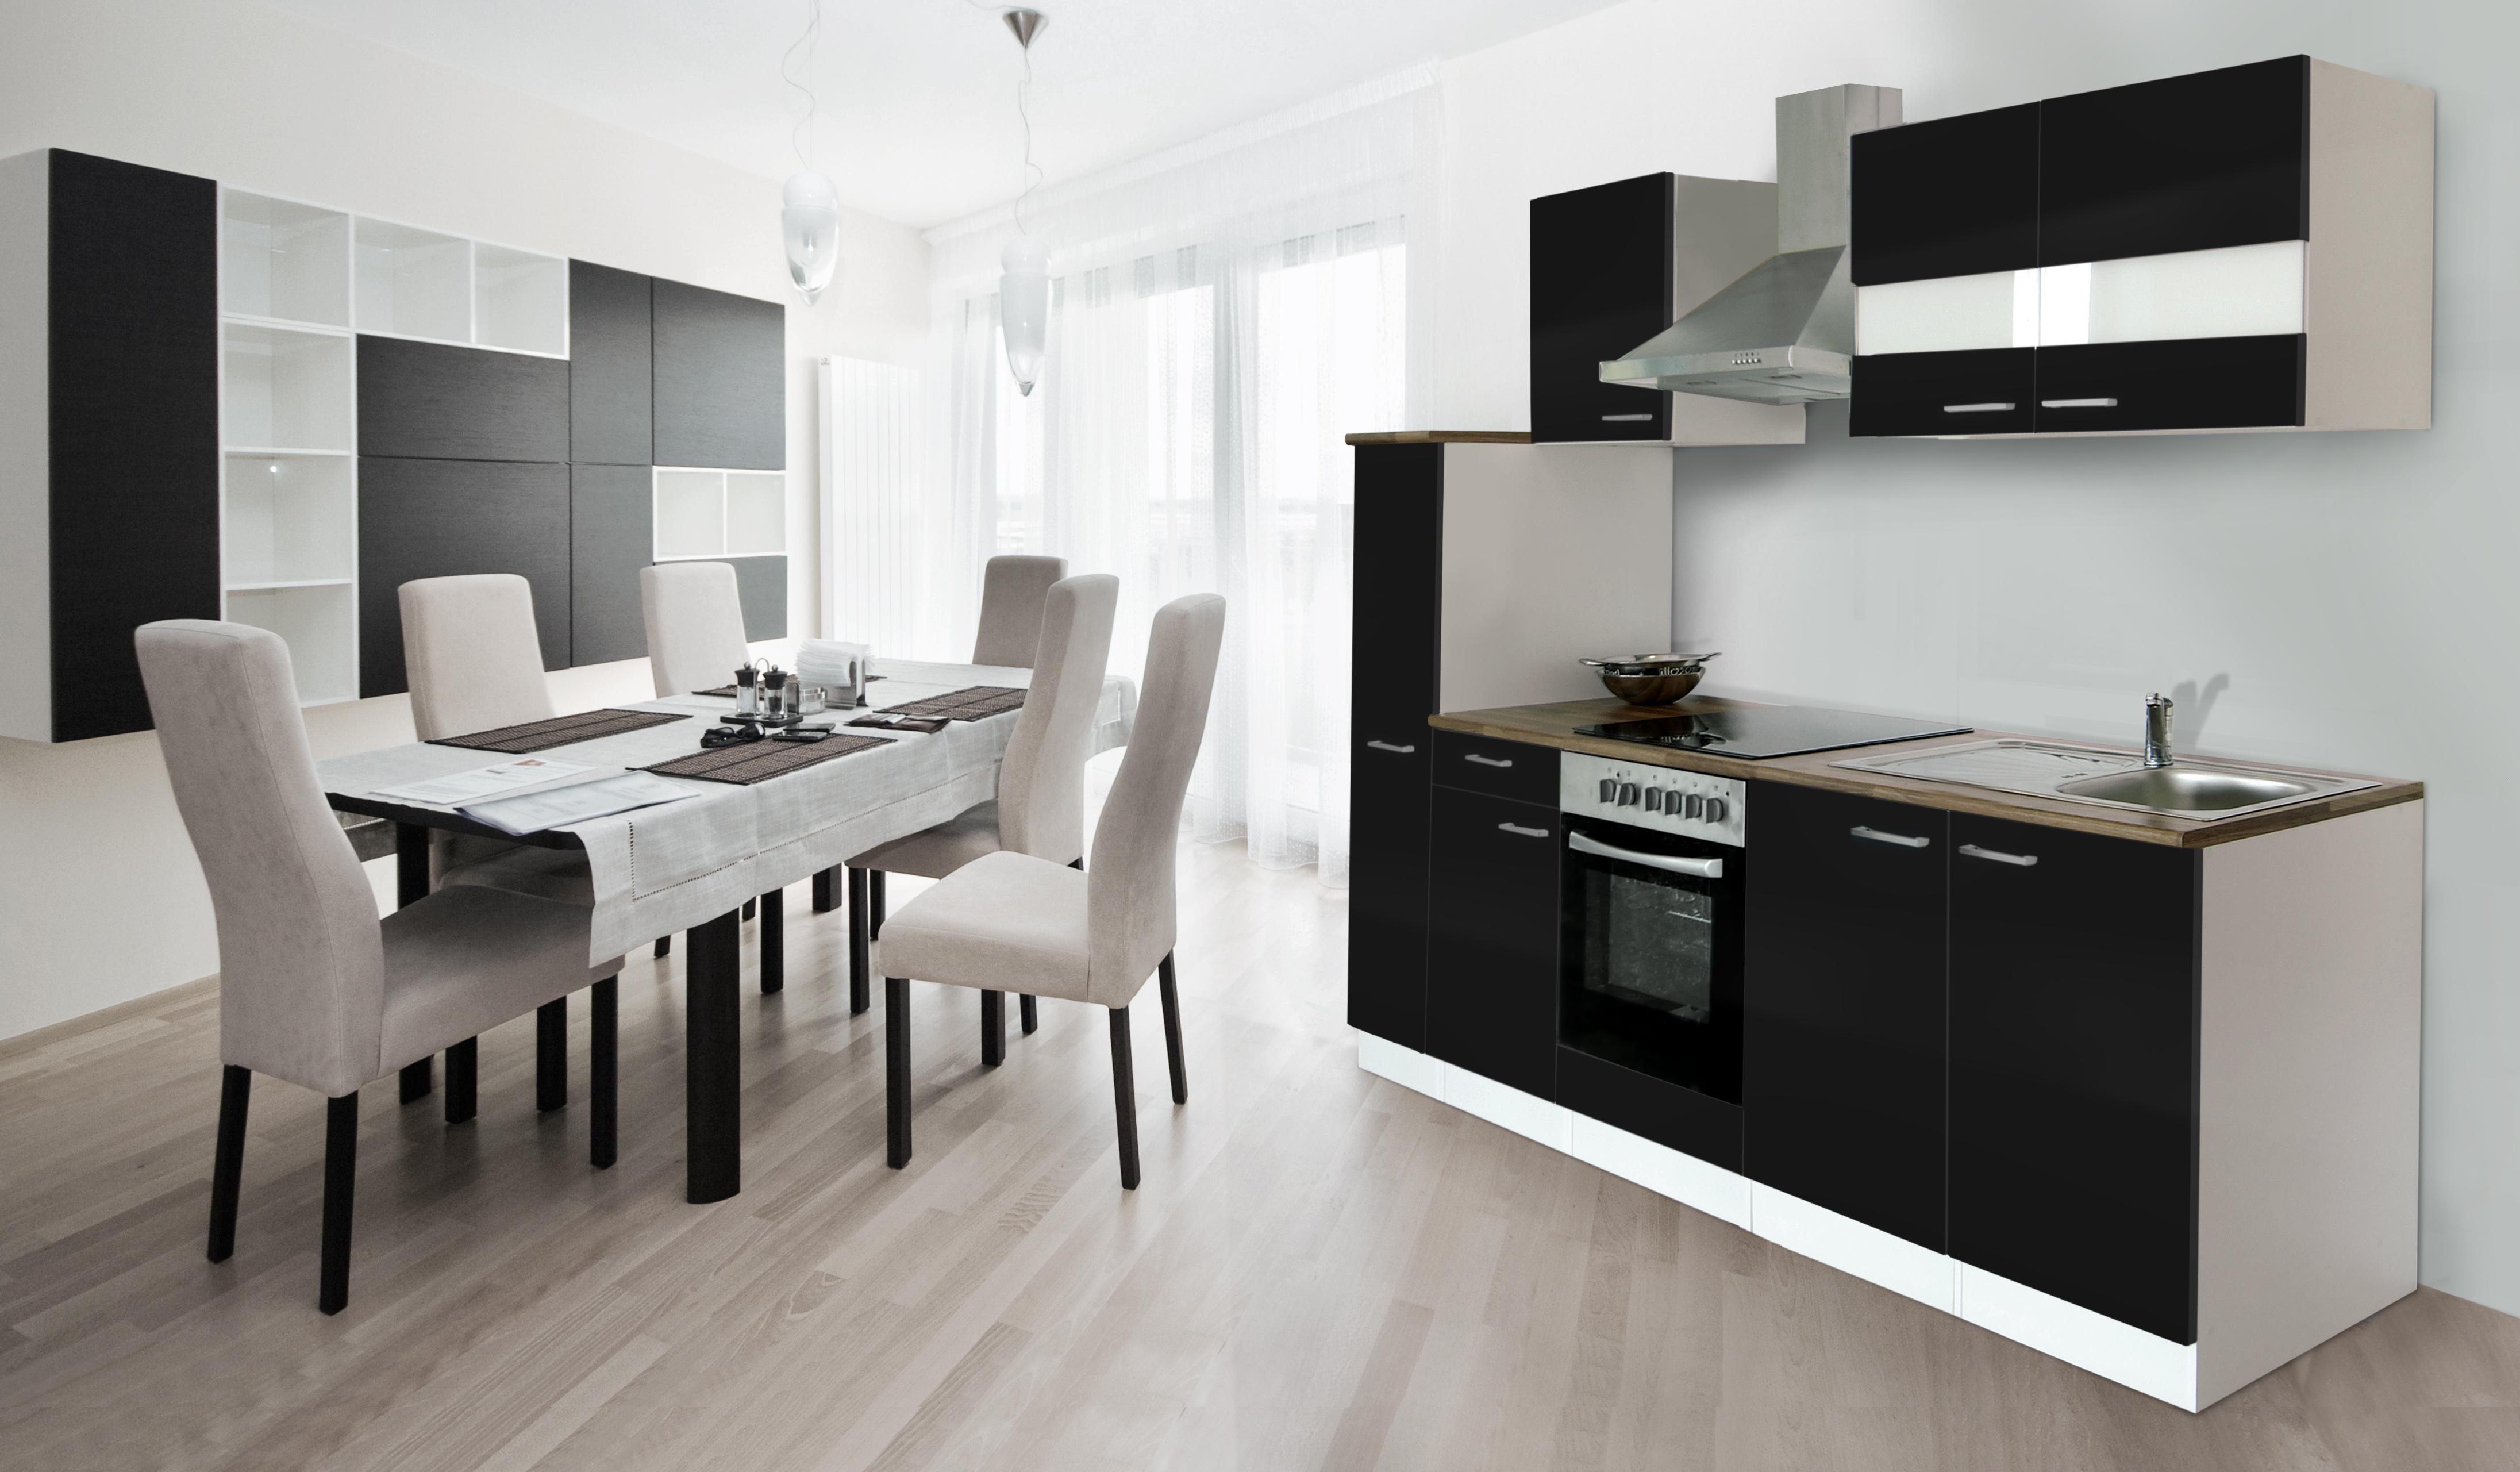 Cucina,Angolo Cucina,Blocco Cucina,Cucina Componibile Completo 240 ...